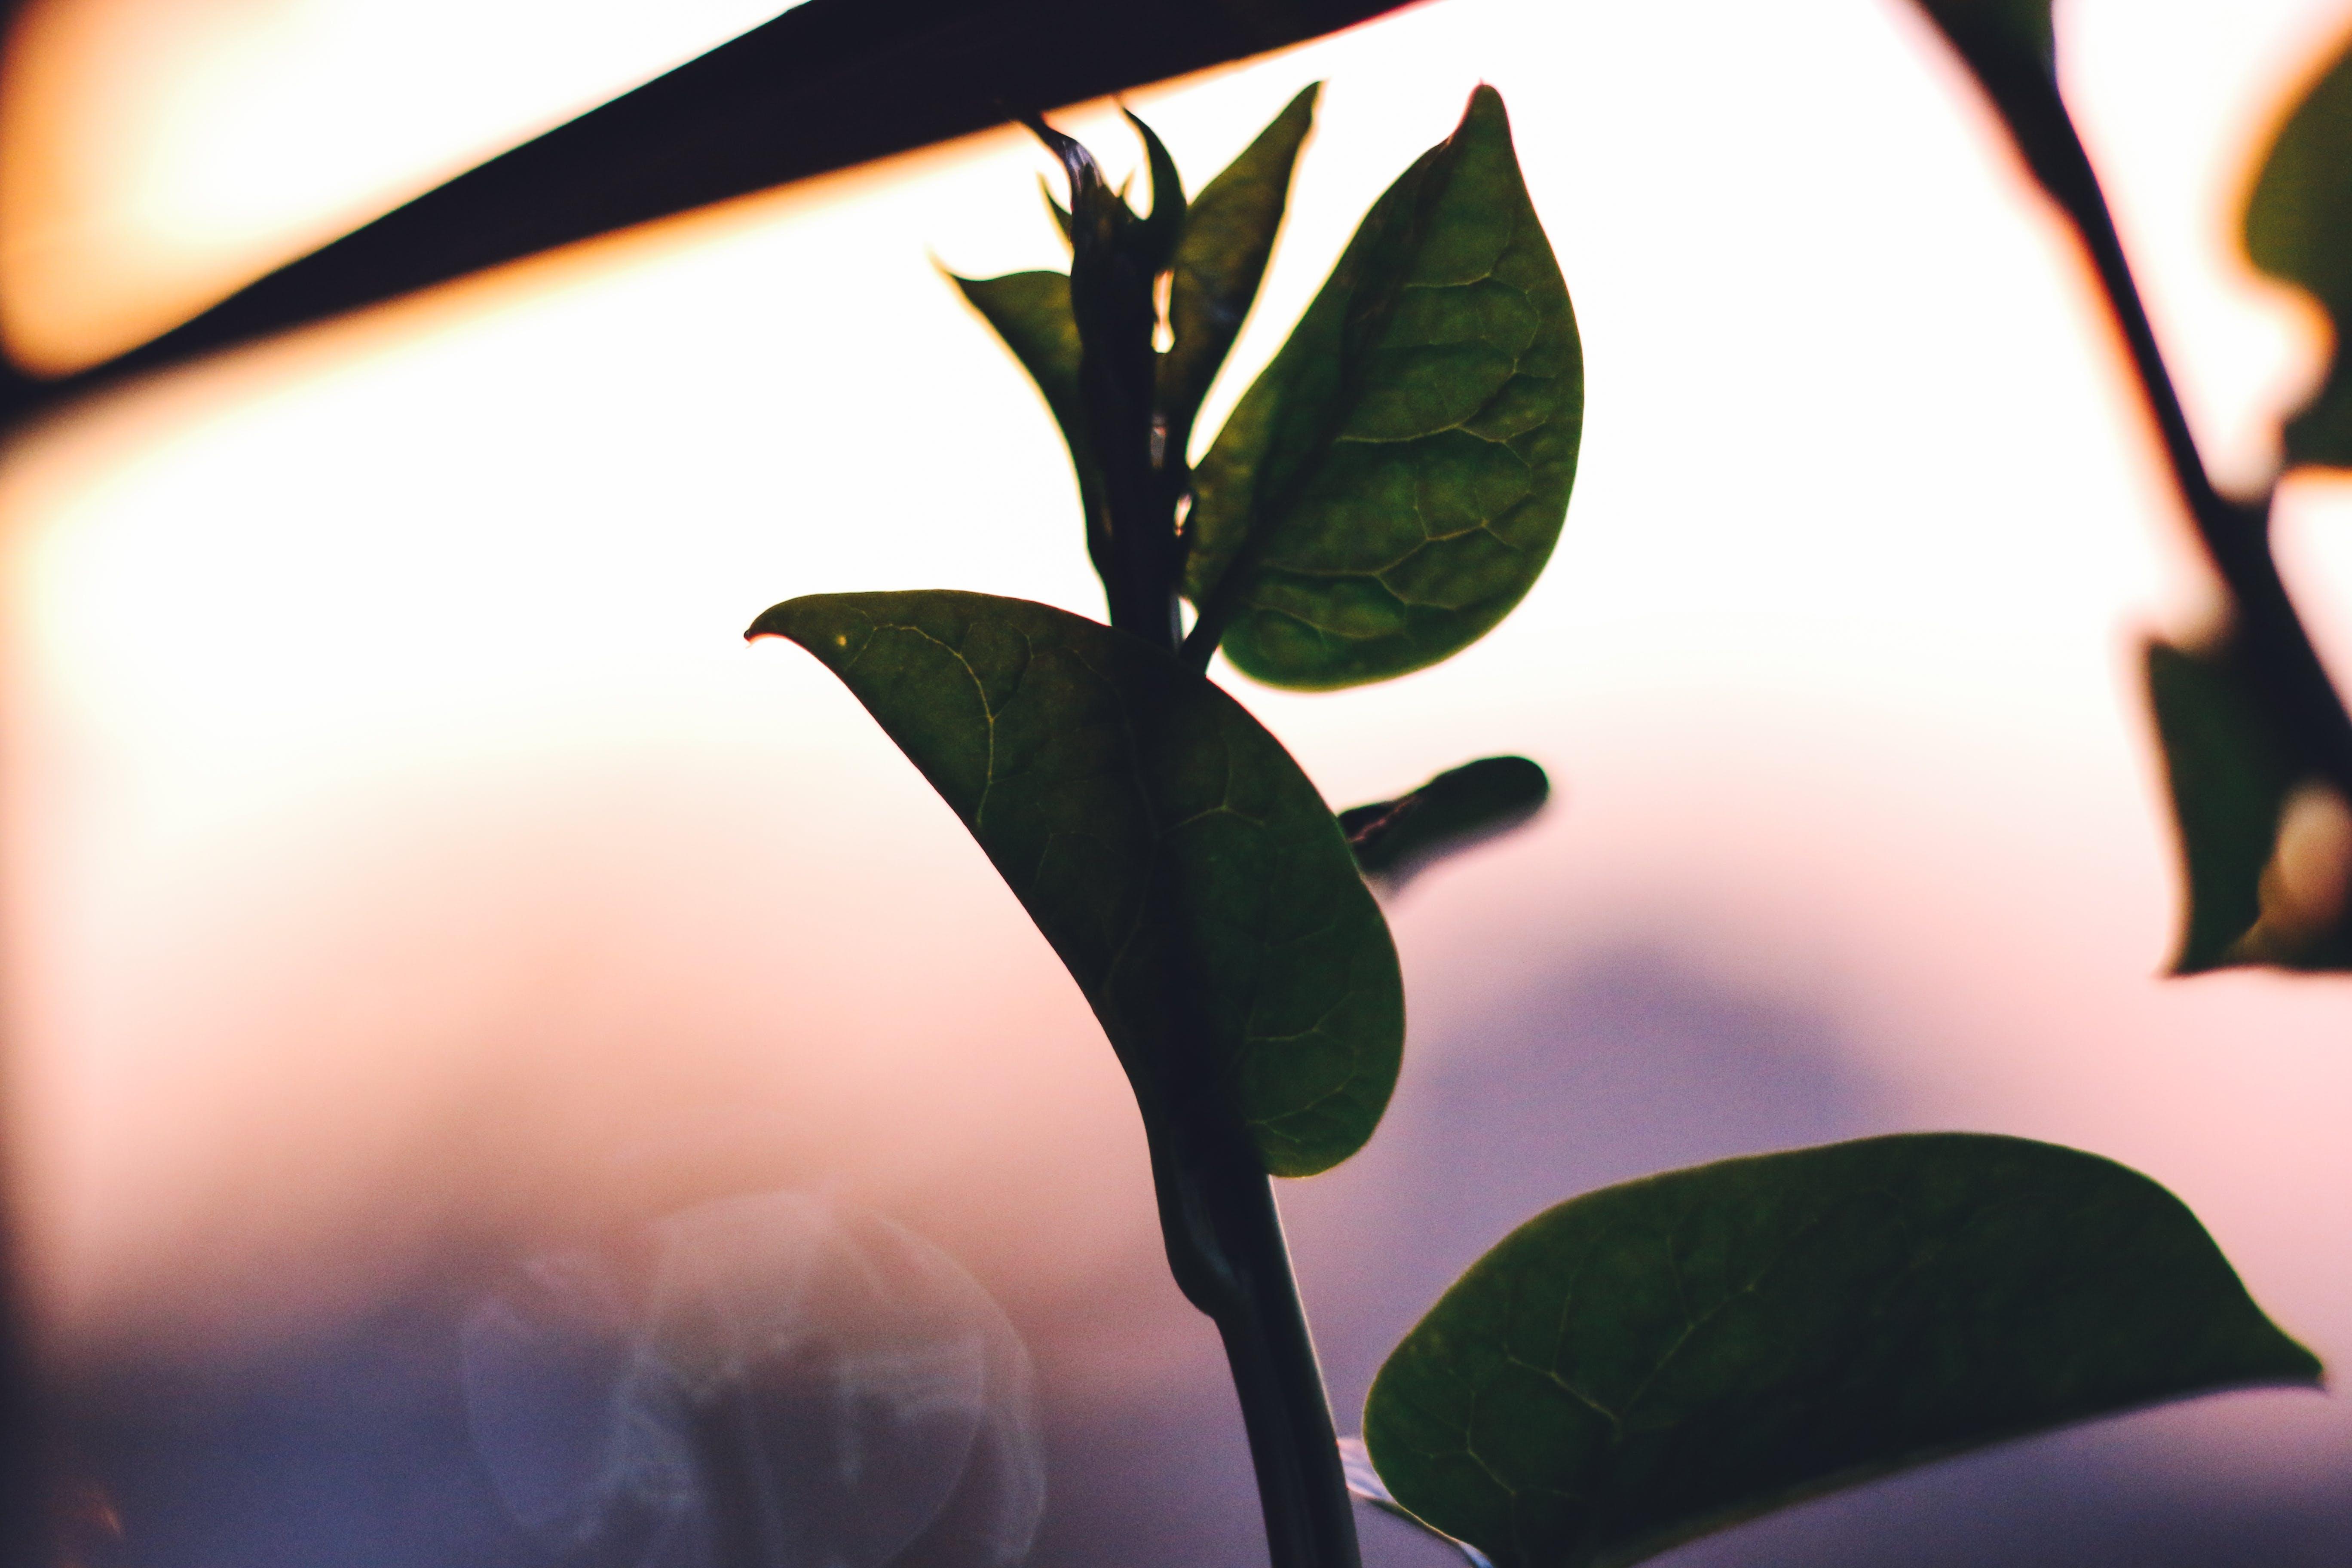 Kostenloses Stock Foto zu Ästhetik, bokeh, goldenen sonnenuntergang